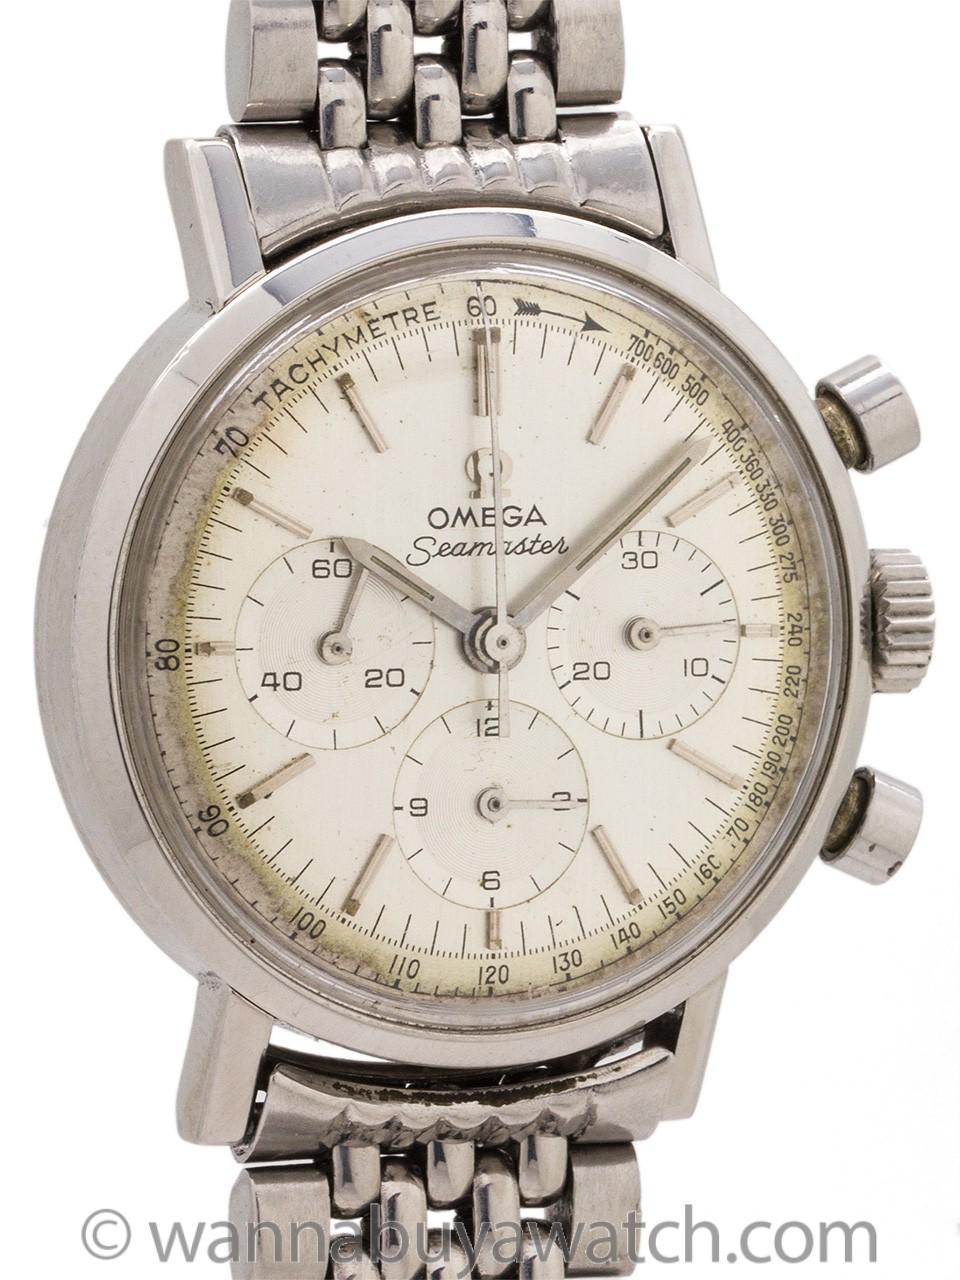 Omega Seamaster Chronograph ref 105.005 Caliber 321 circa 1966